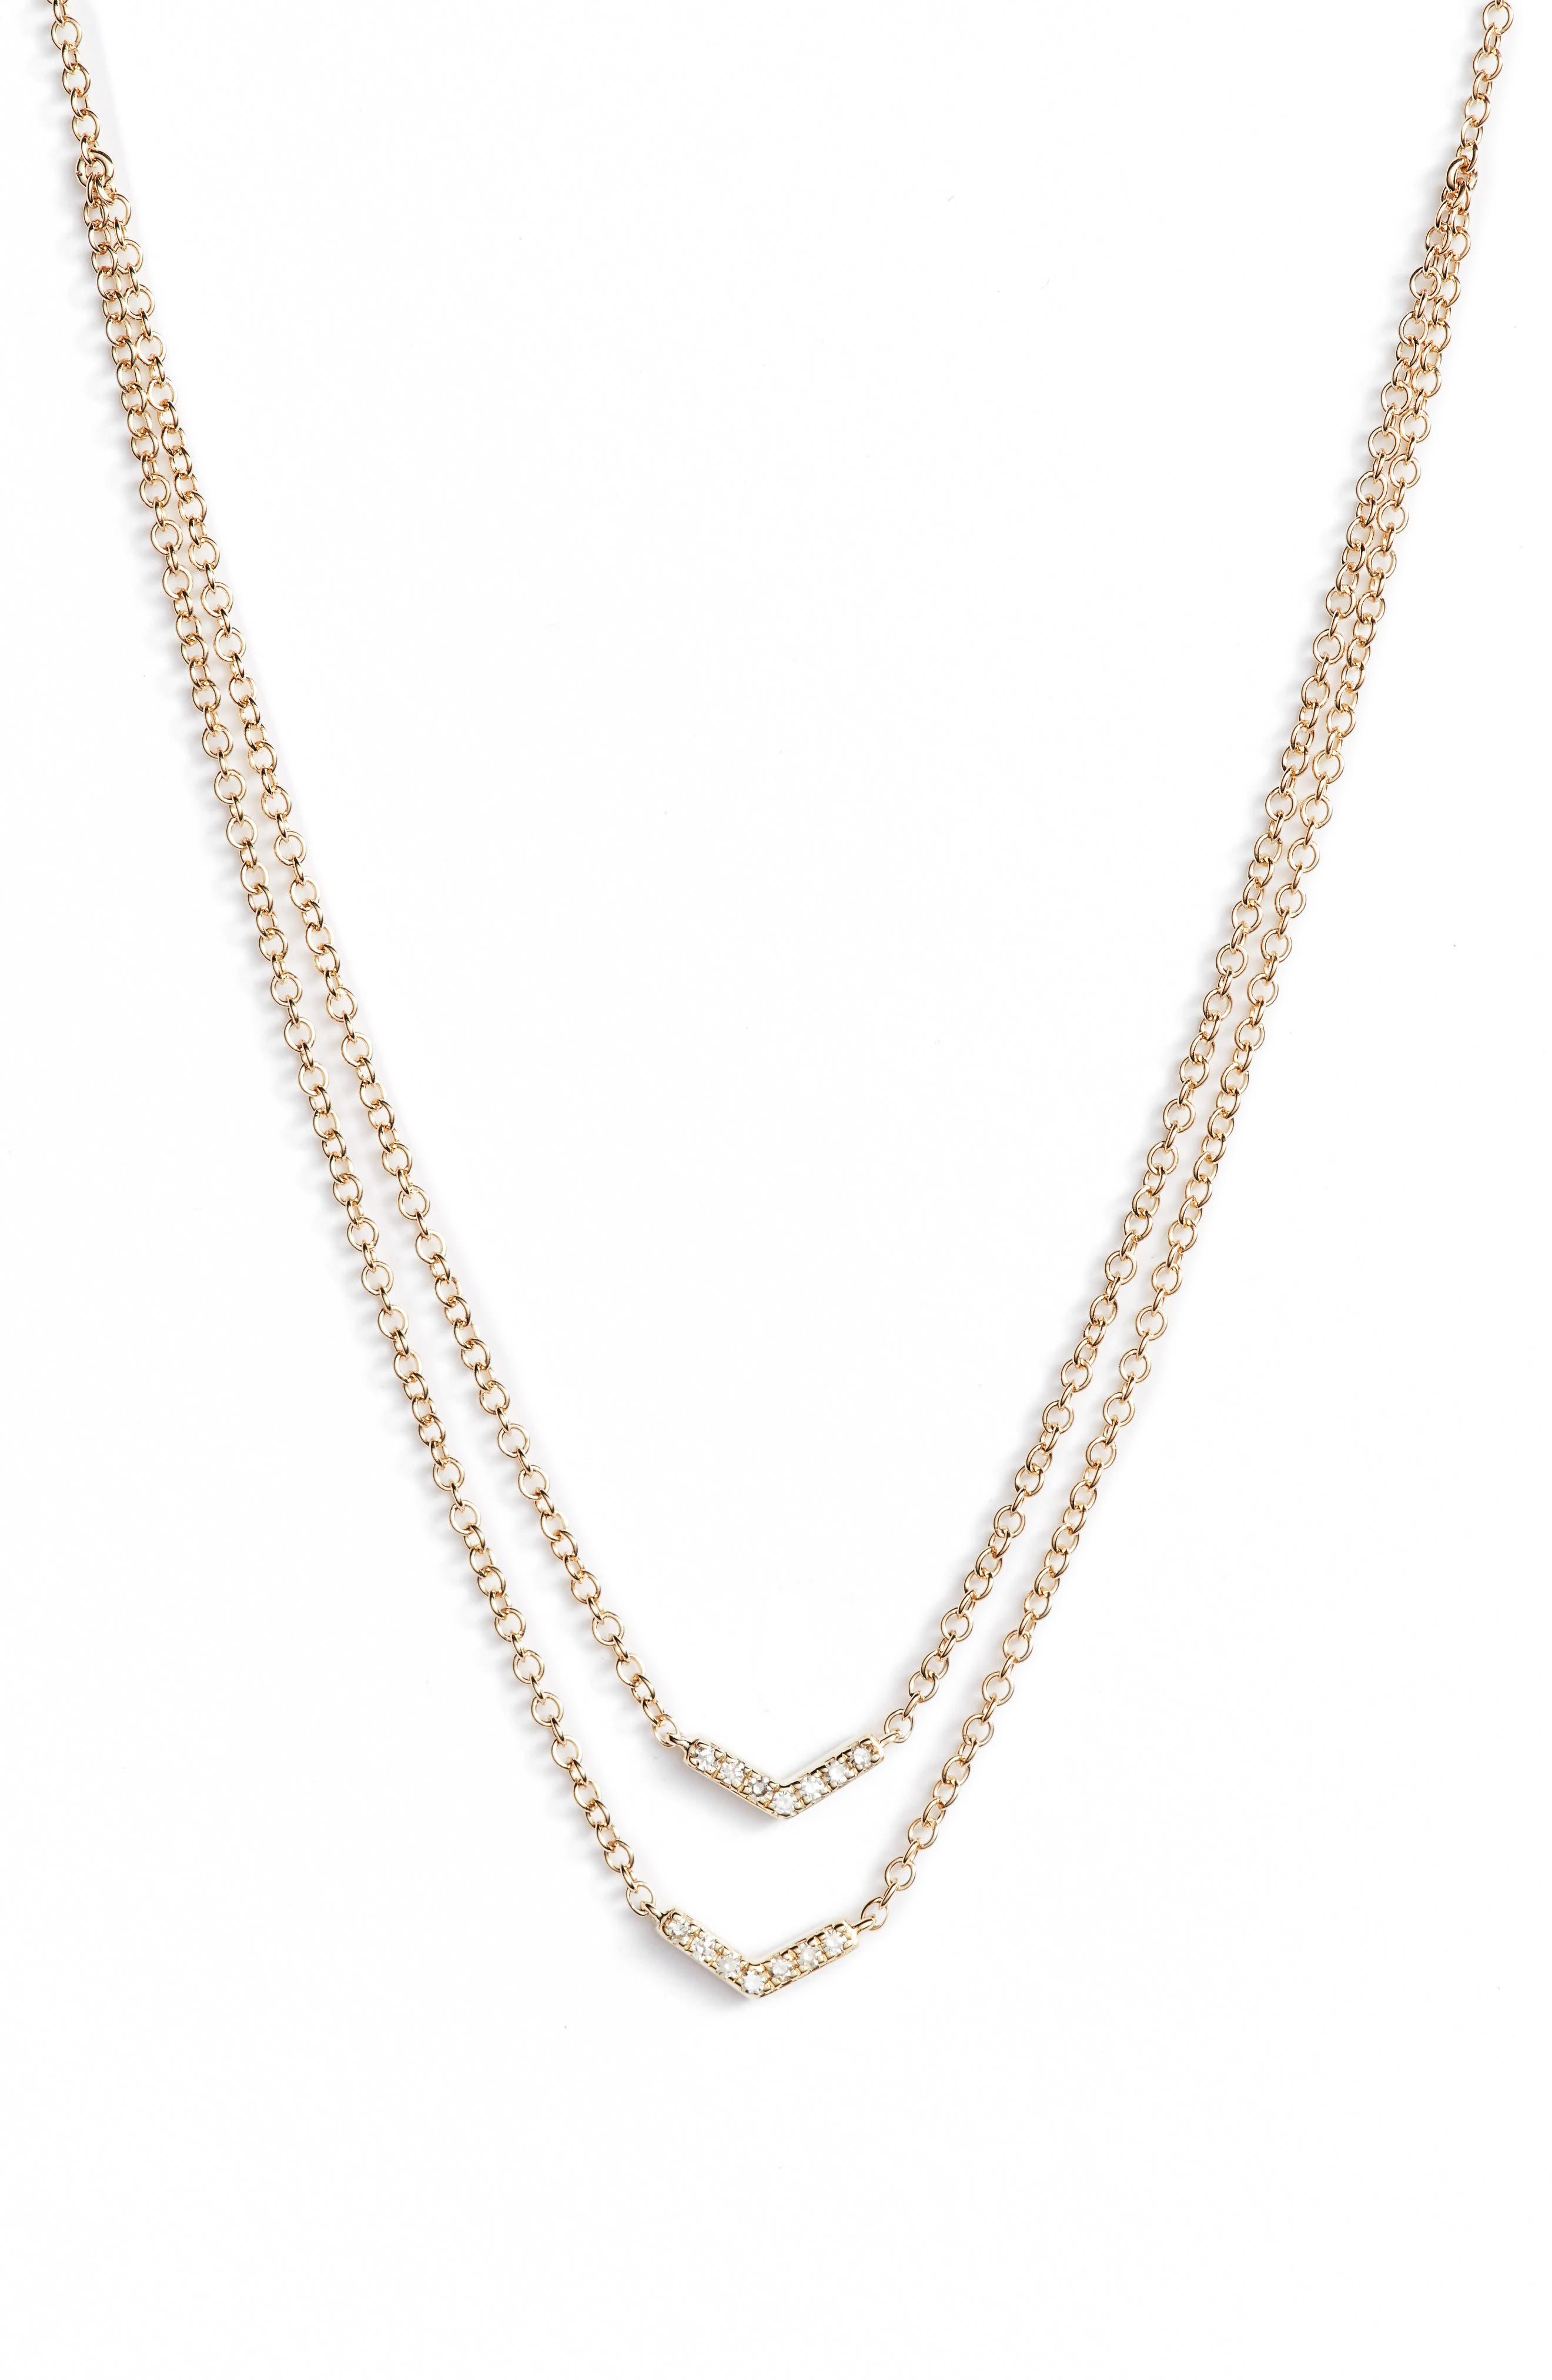 Double Row Chevron Diamond Necklace,                             Main thumbnail 1, color,                             YELLOW GOLD